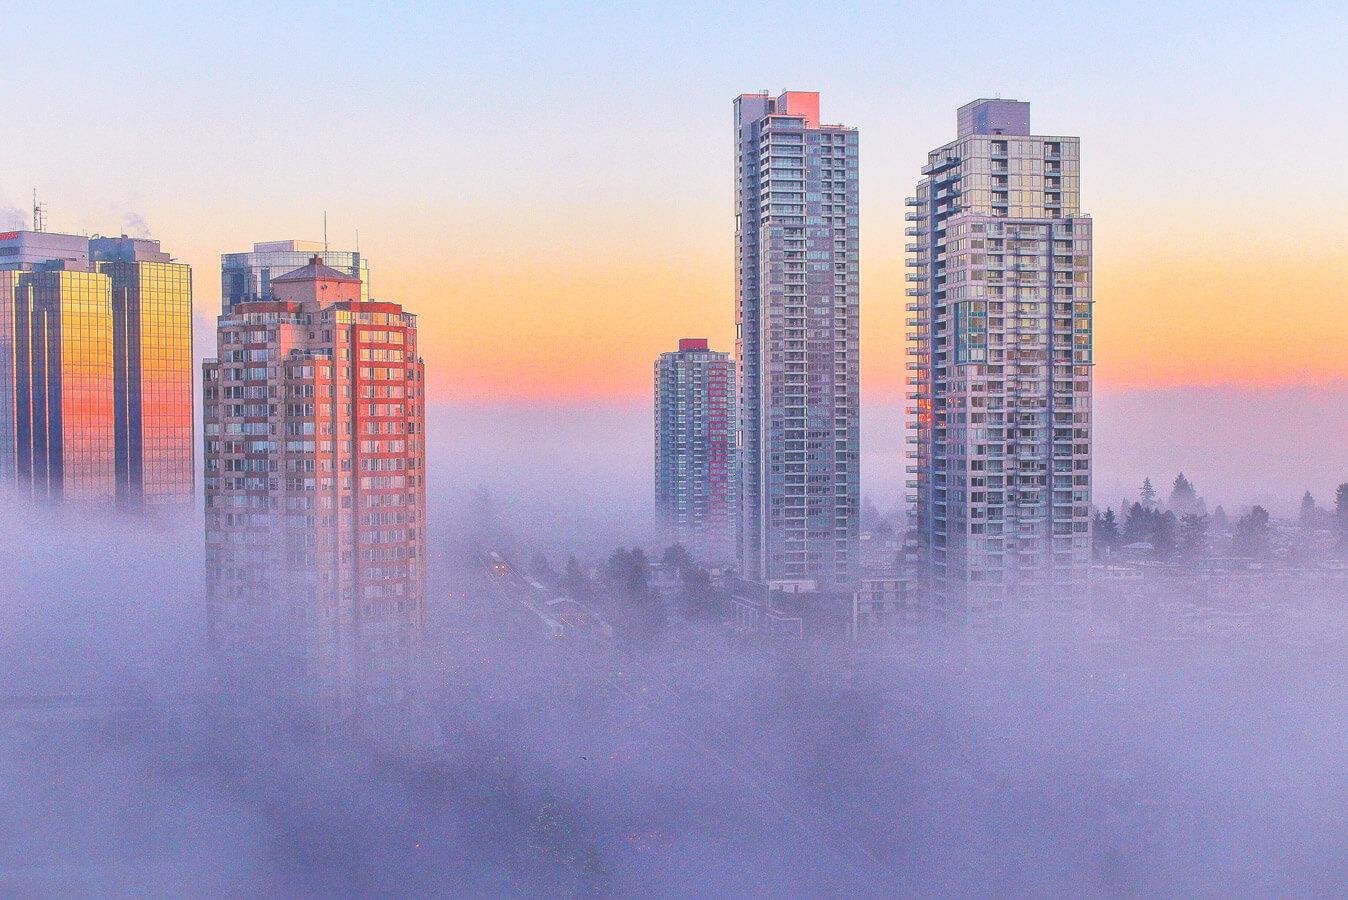 azure-sql-data-warehouse-clouds.jpg